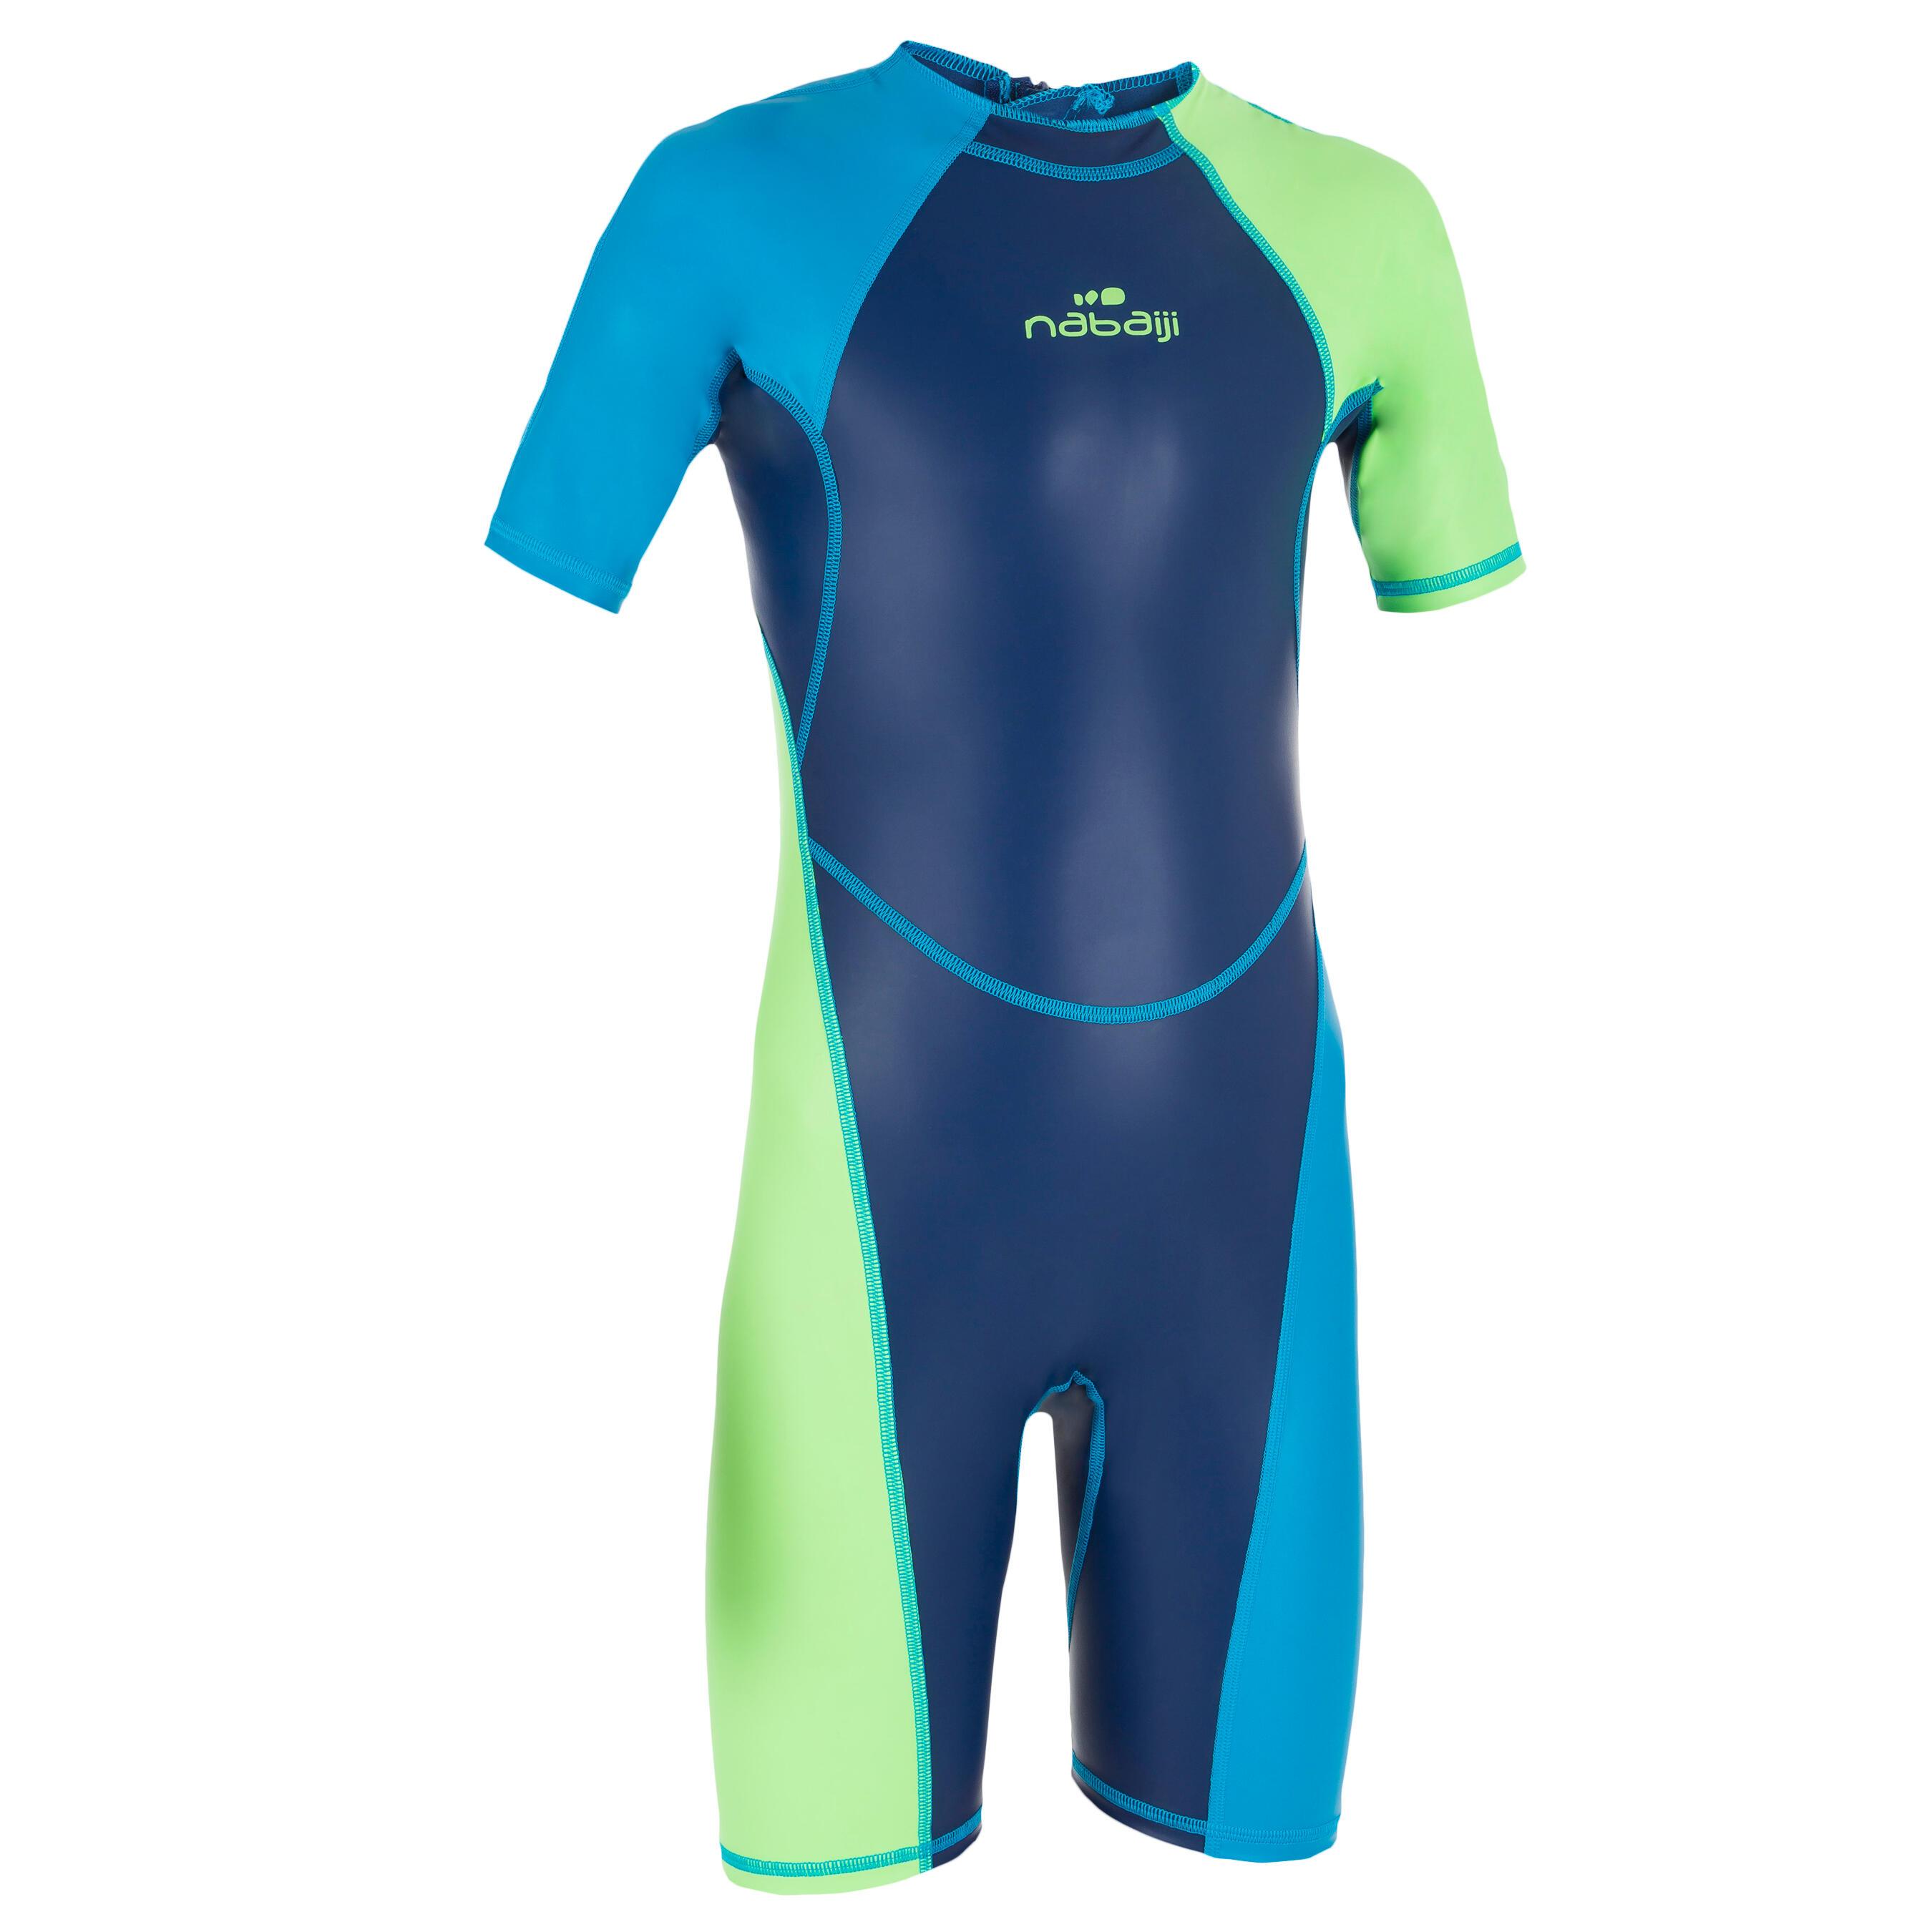 Nabaiji Zwemshorty voor jongens Kloupi blauw/groen